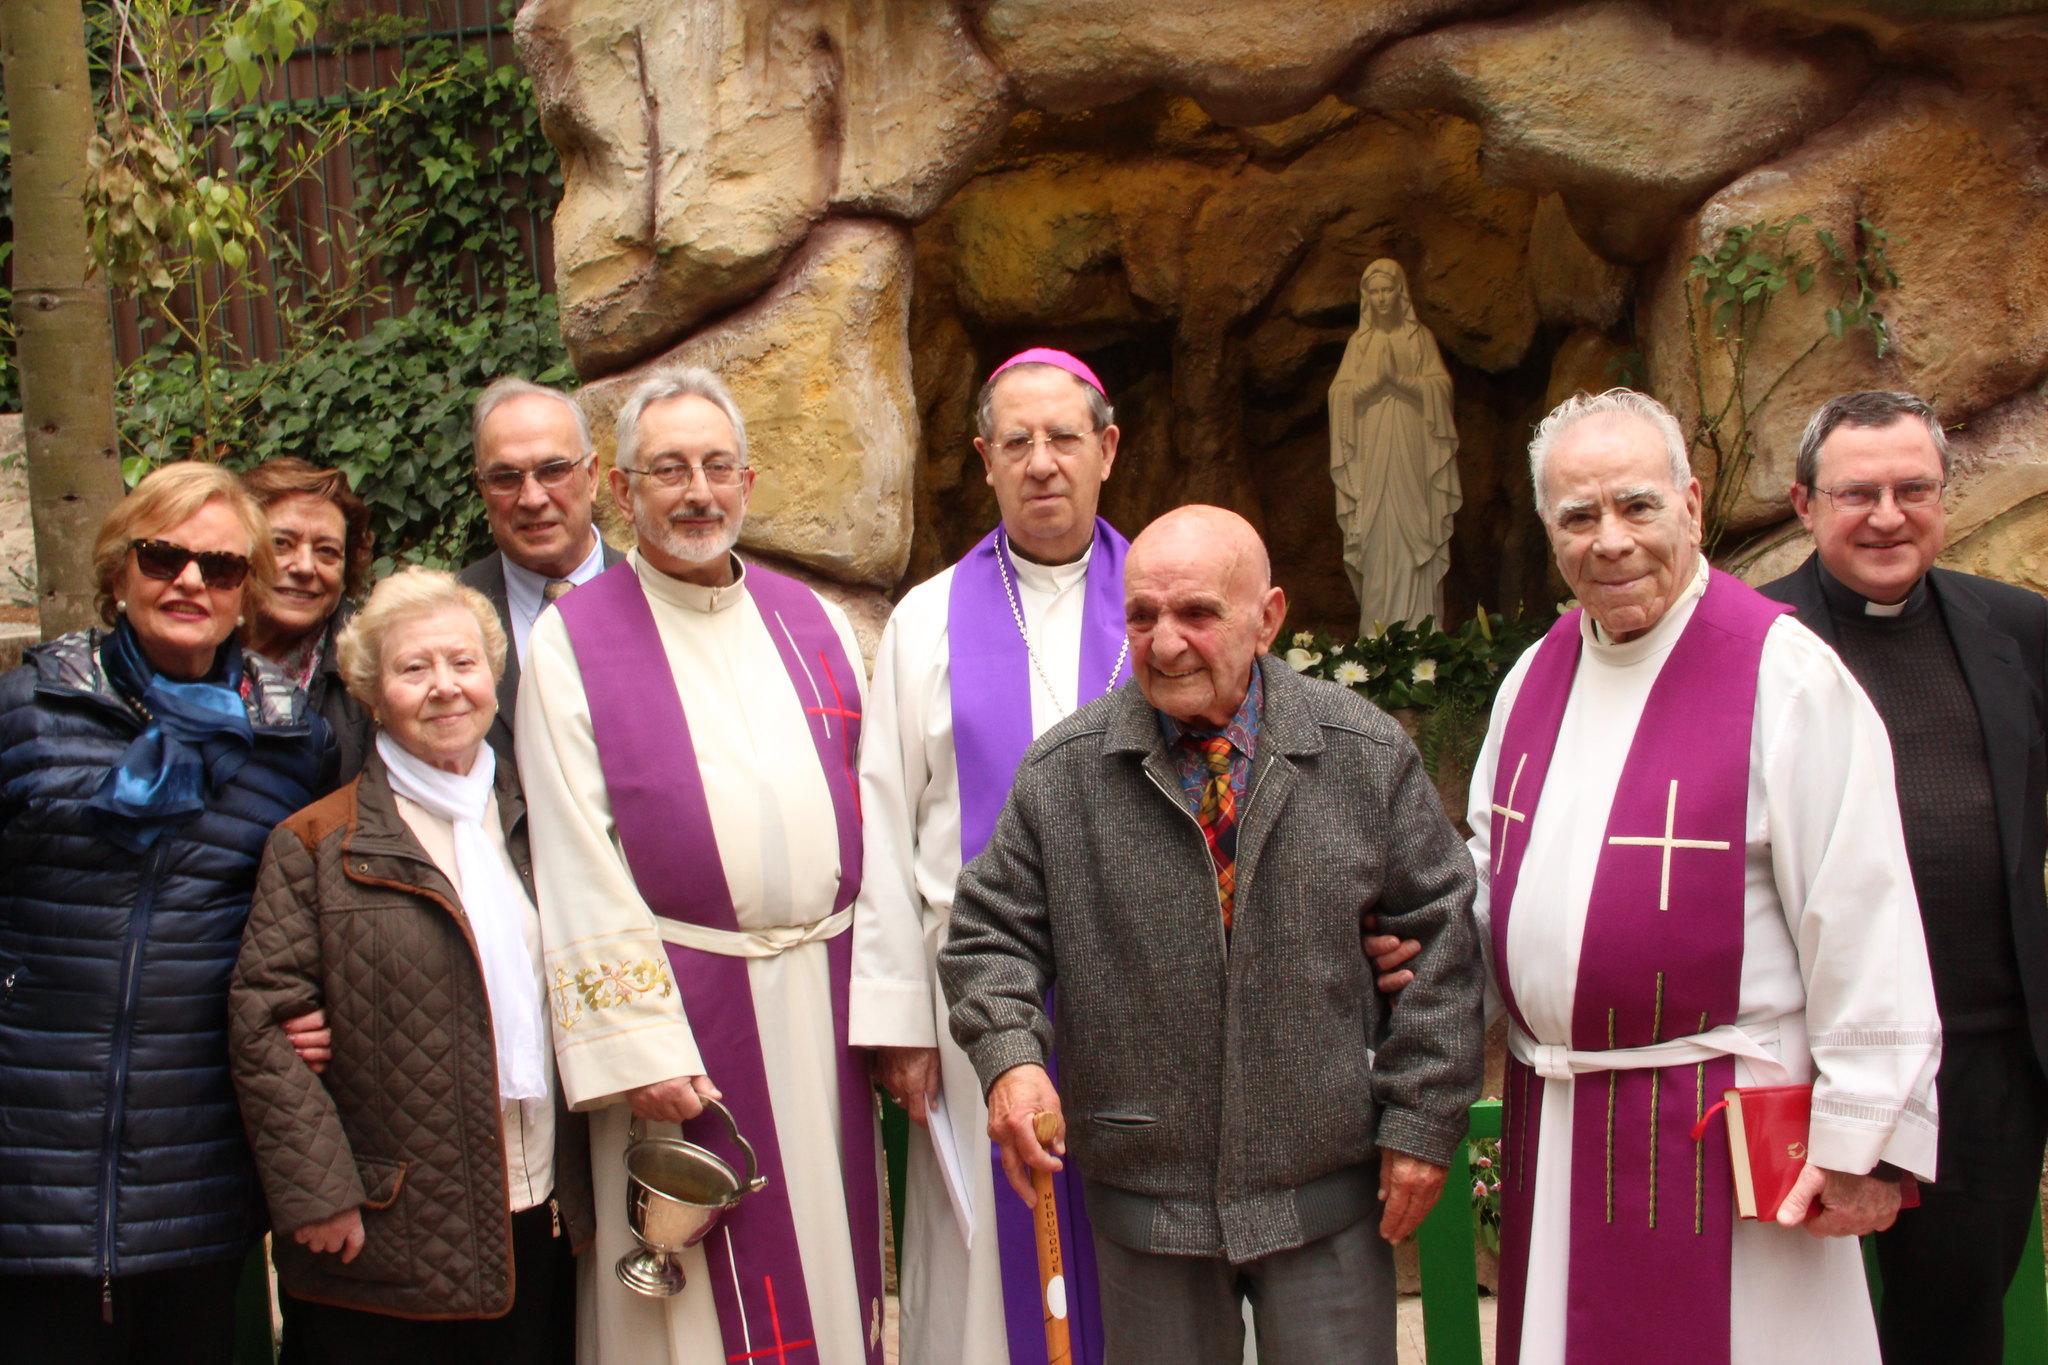 (2016-02-13) - Inauguración Virgen De Lourdes, La Molineta - Archivo La Molineta (097)